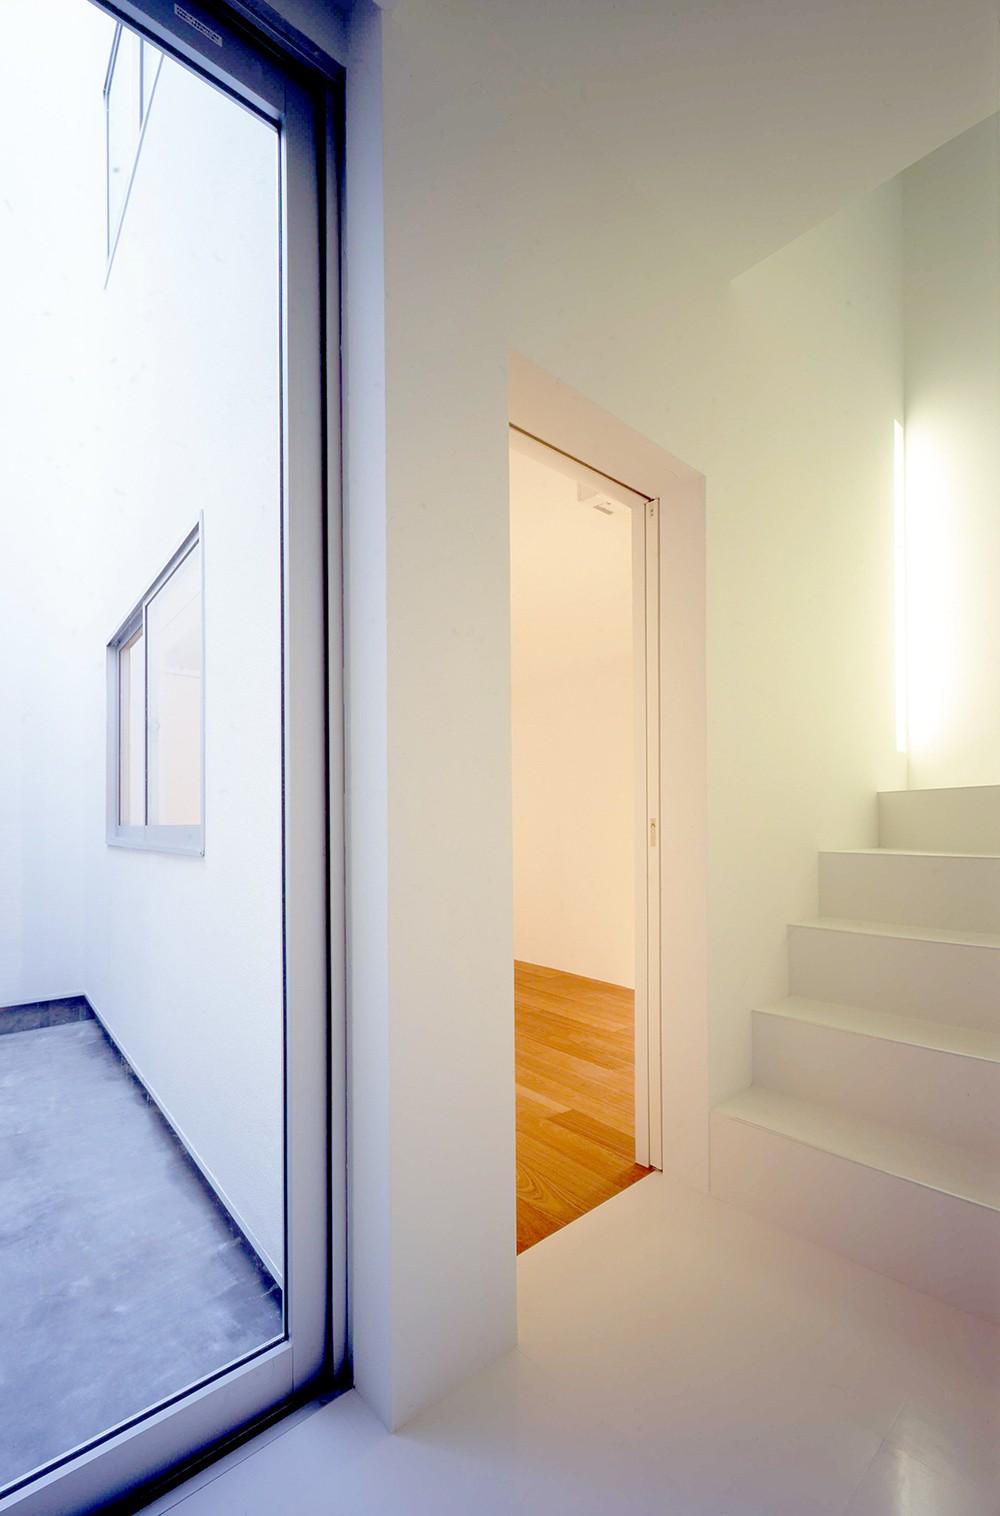 向河原の住宅 (1階寝室)